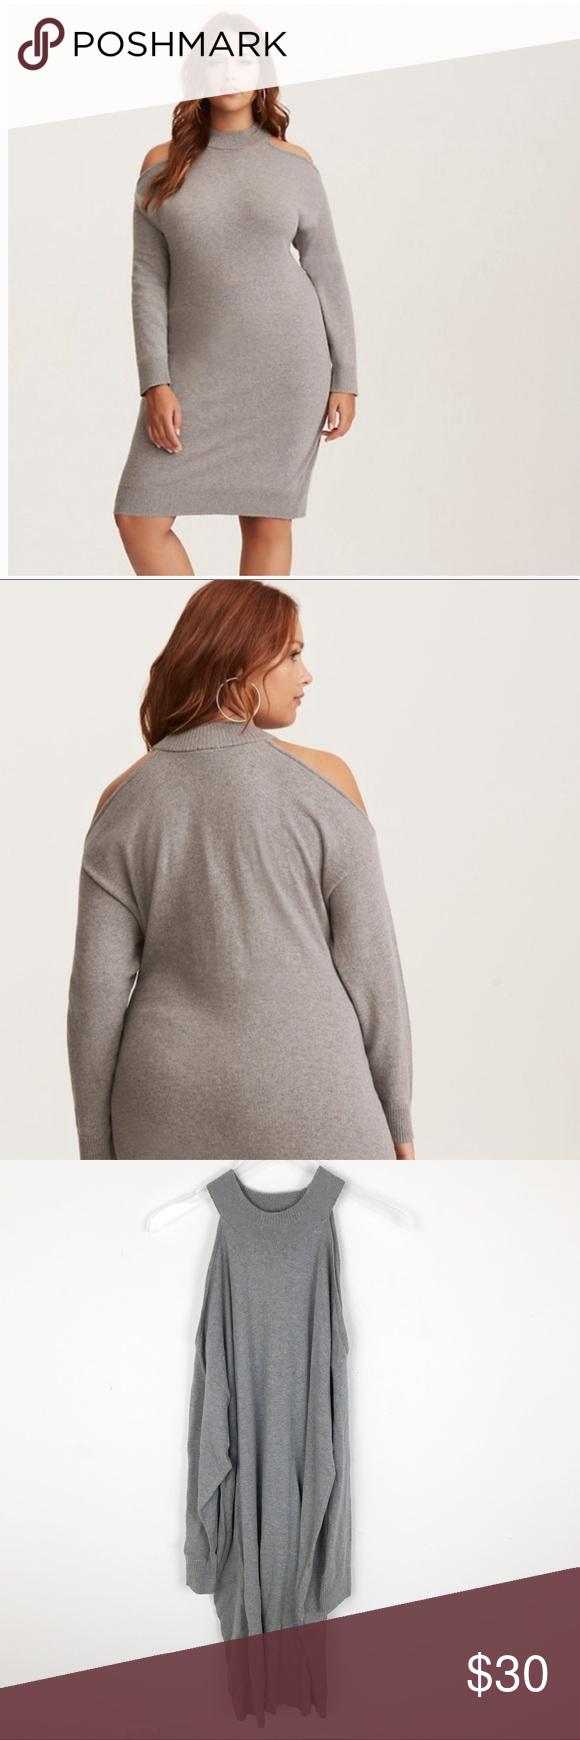 e7da248a6c58 Torrid Grey Cold Shoulder Sweater Dress 2X 3X This sweater dress is so cute!  Heather